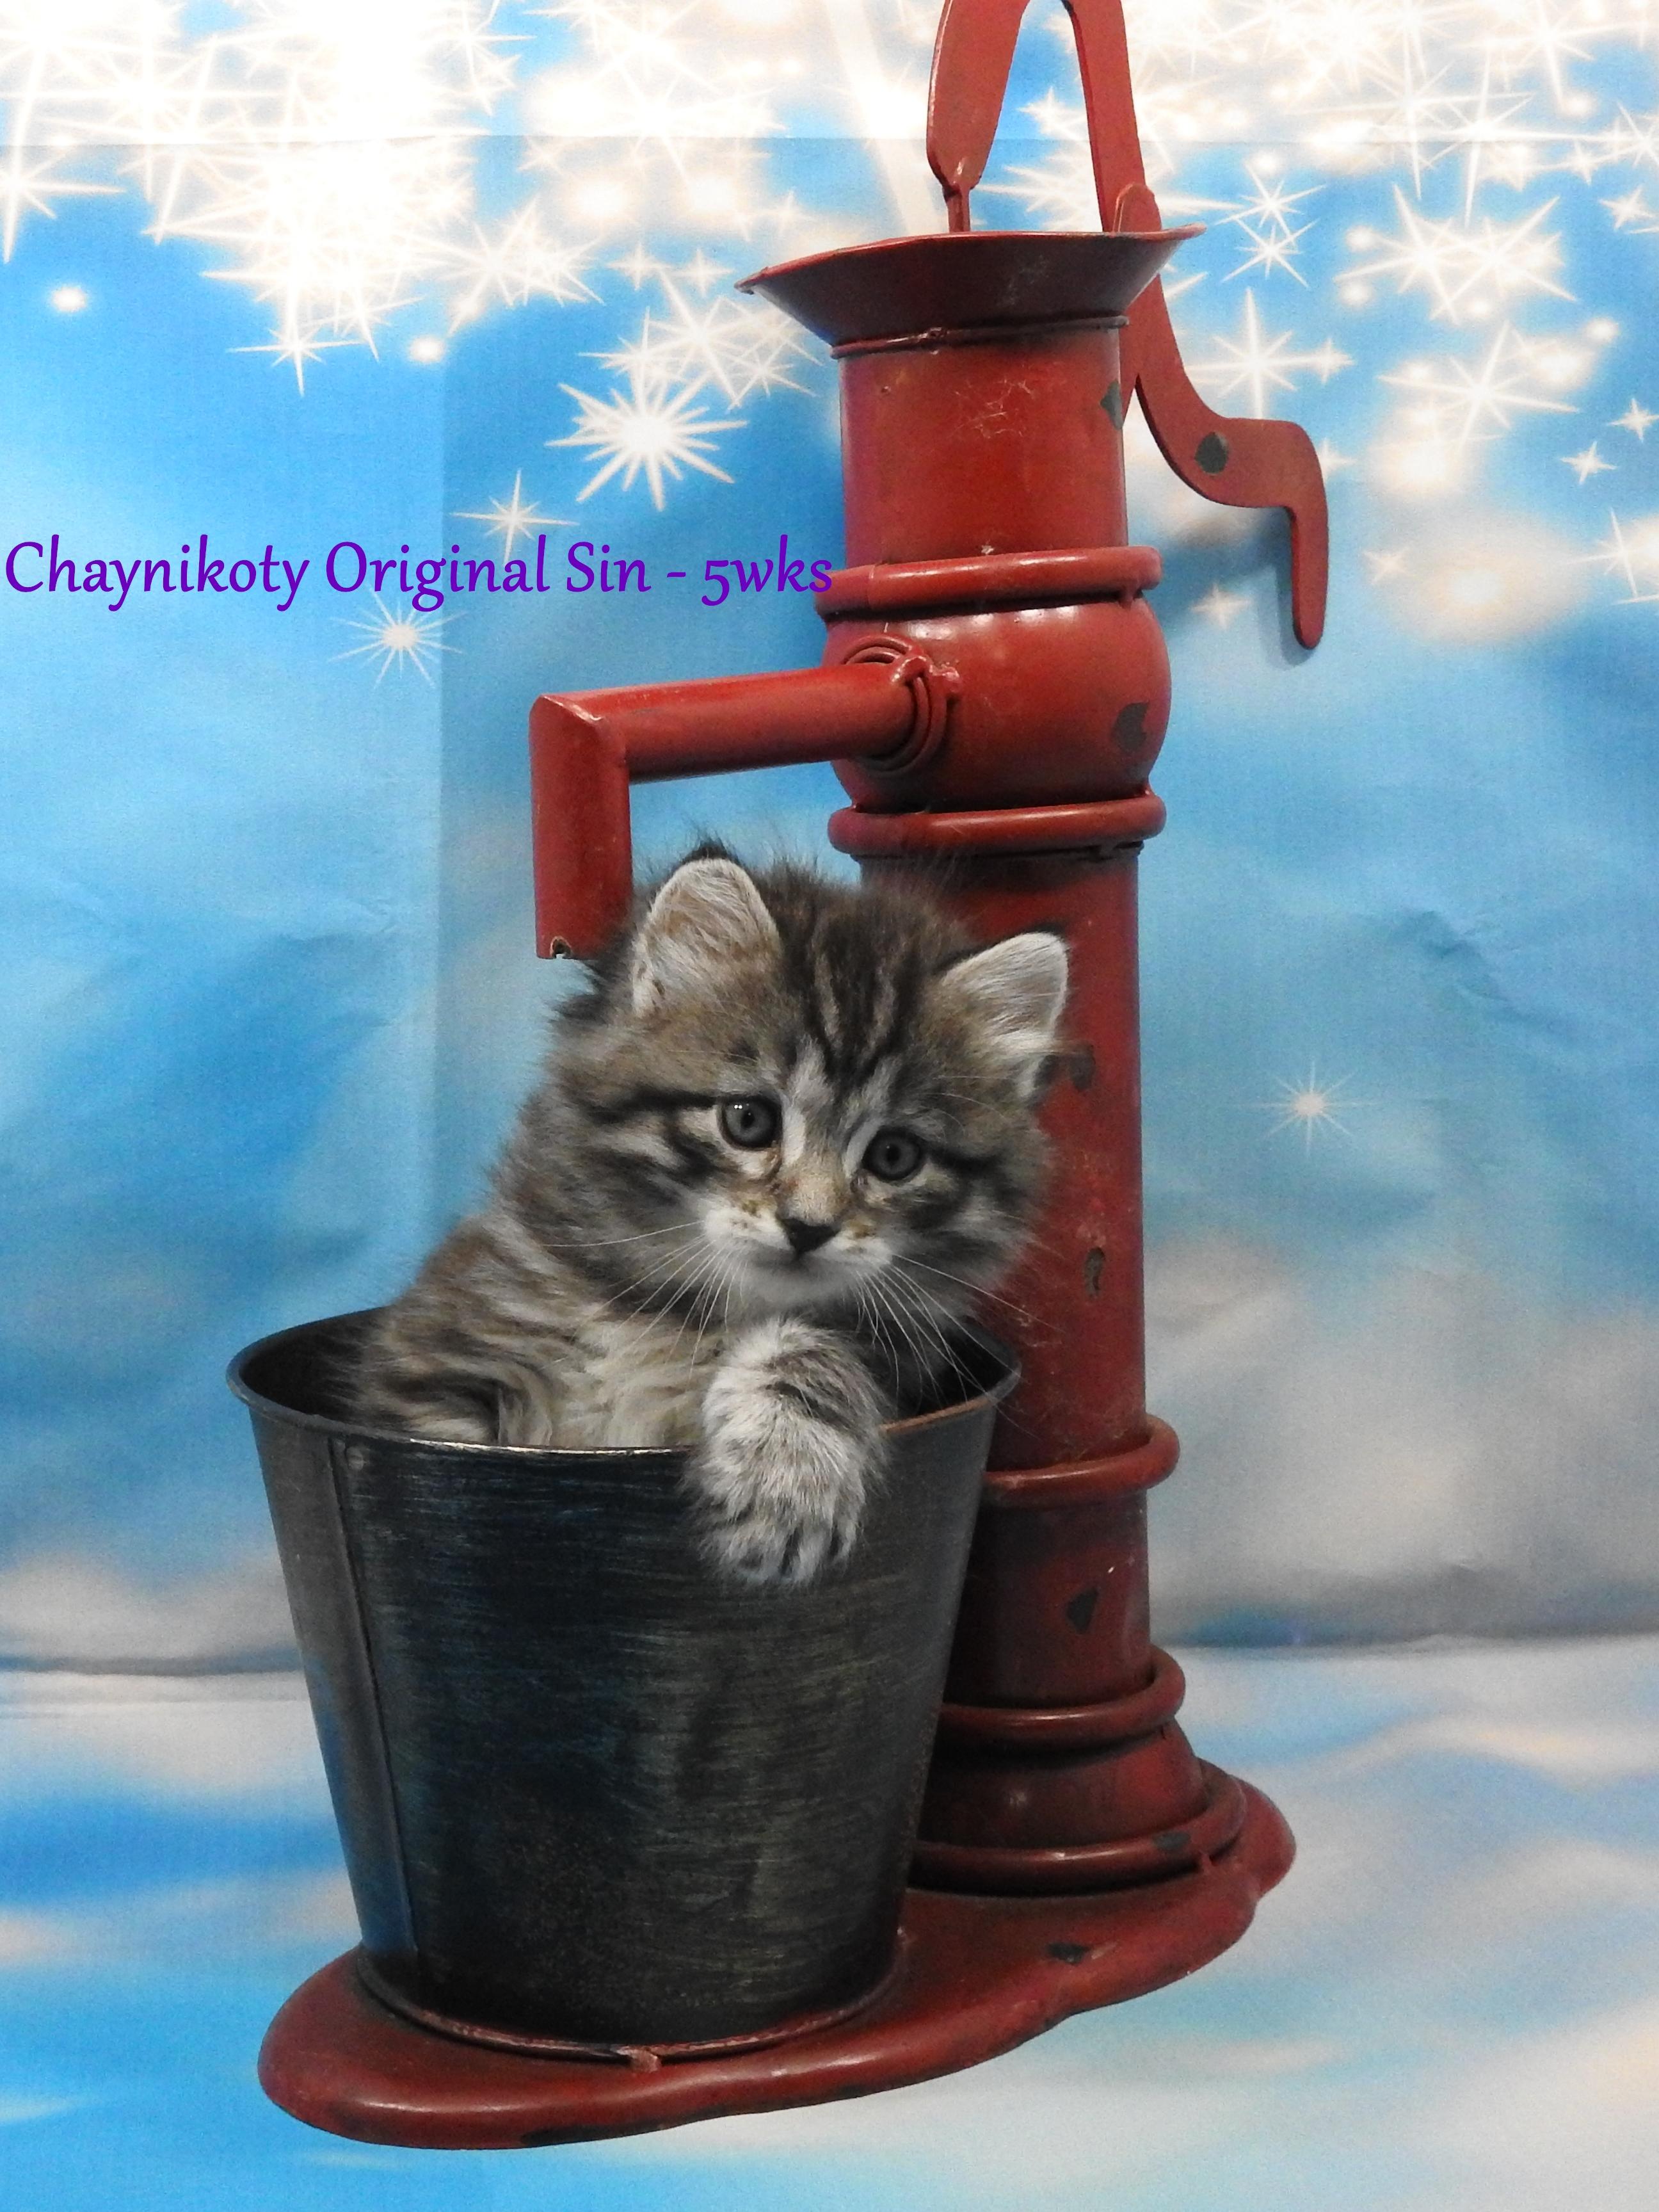 Chaynikoty Original Sin